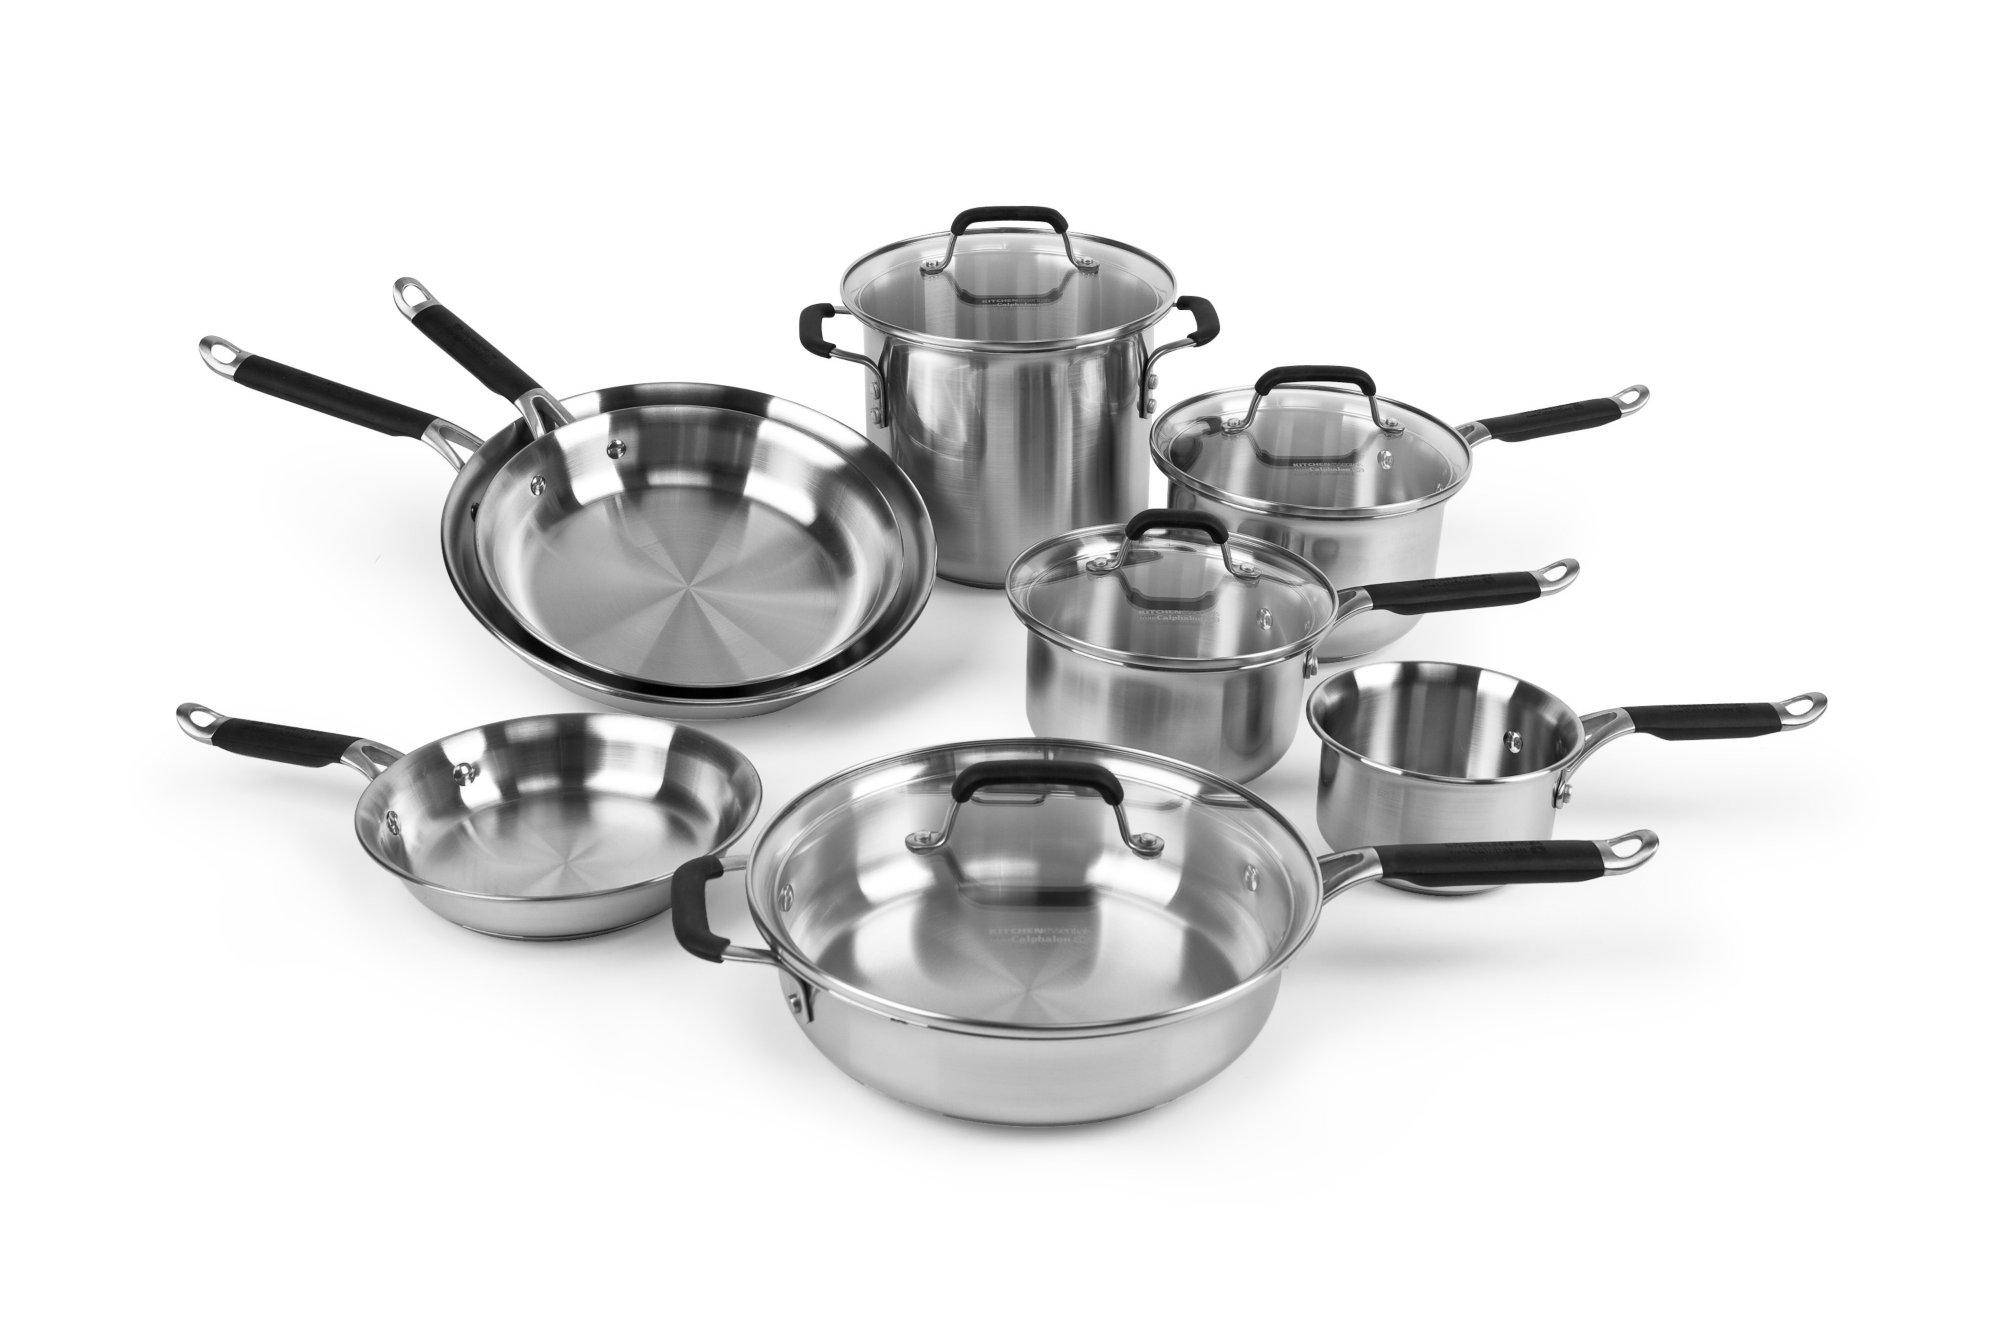 Calphalon Kitchen Essentials Stainless Steel 12-pc. Cookware ...